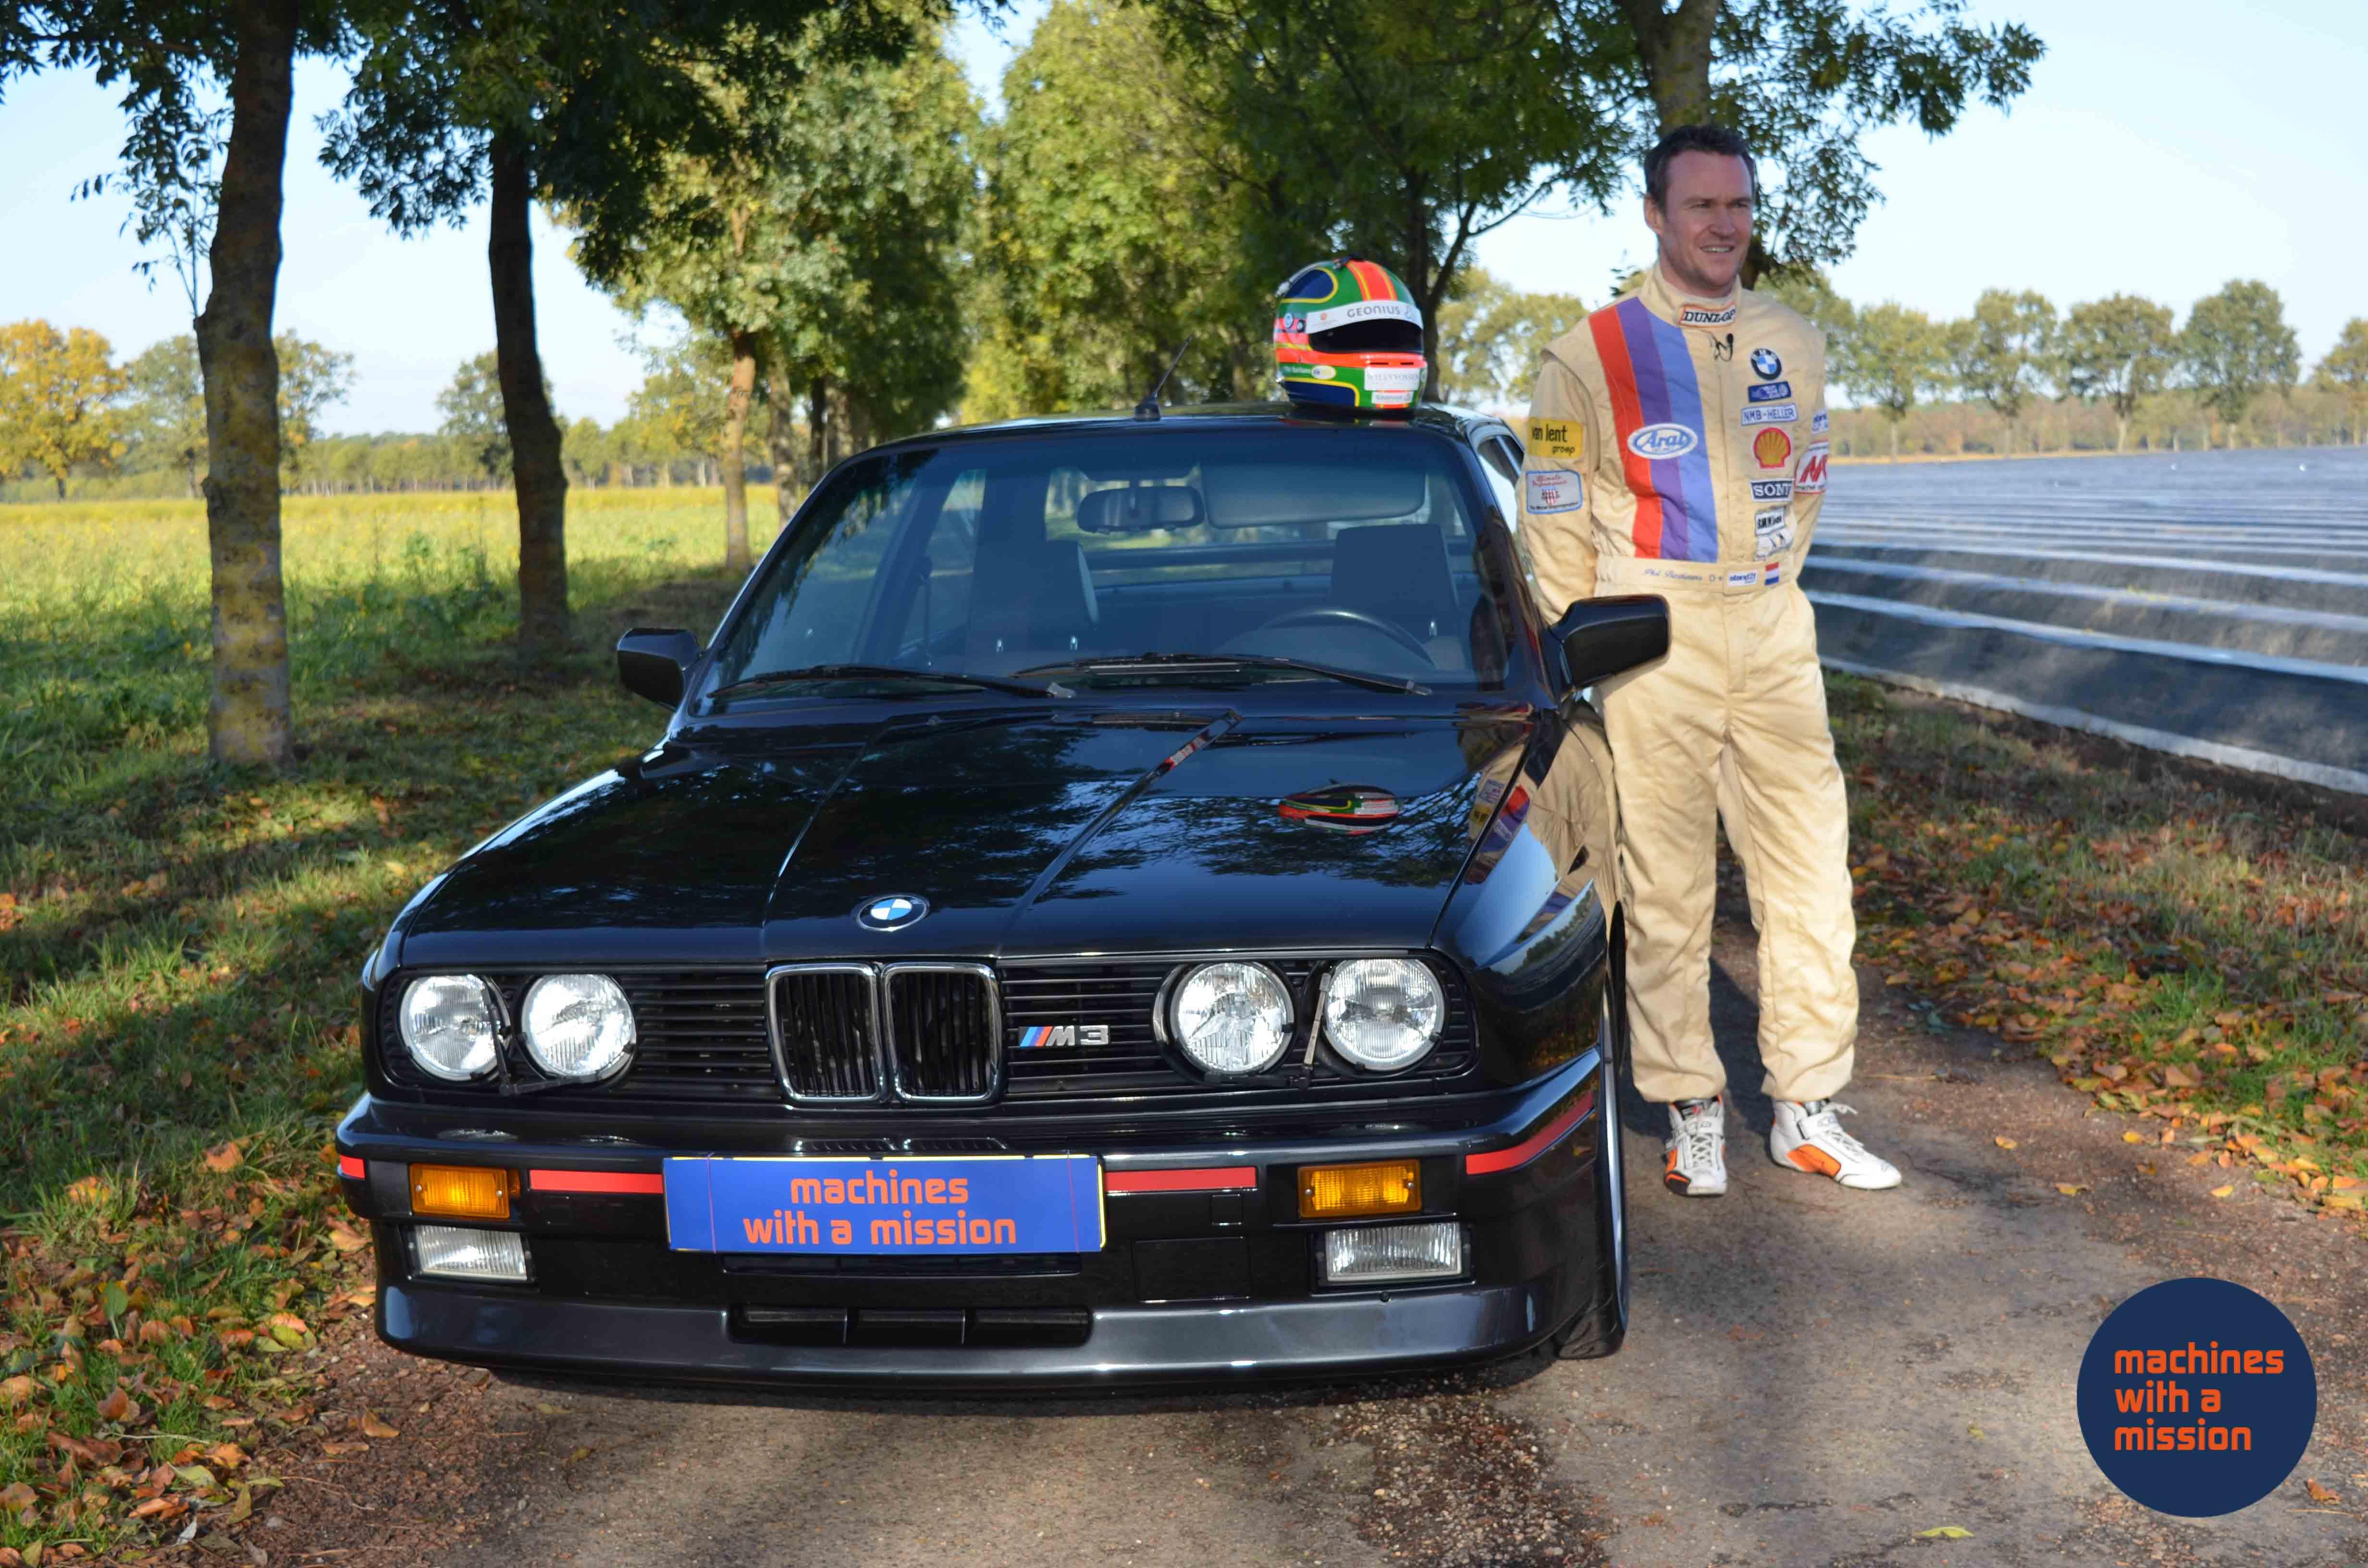 BMW-M3-PB-Machineswithamission2 (25 van 25)